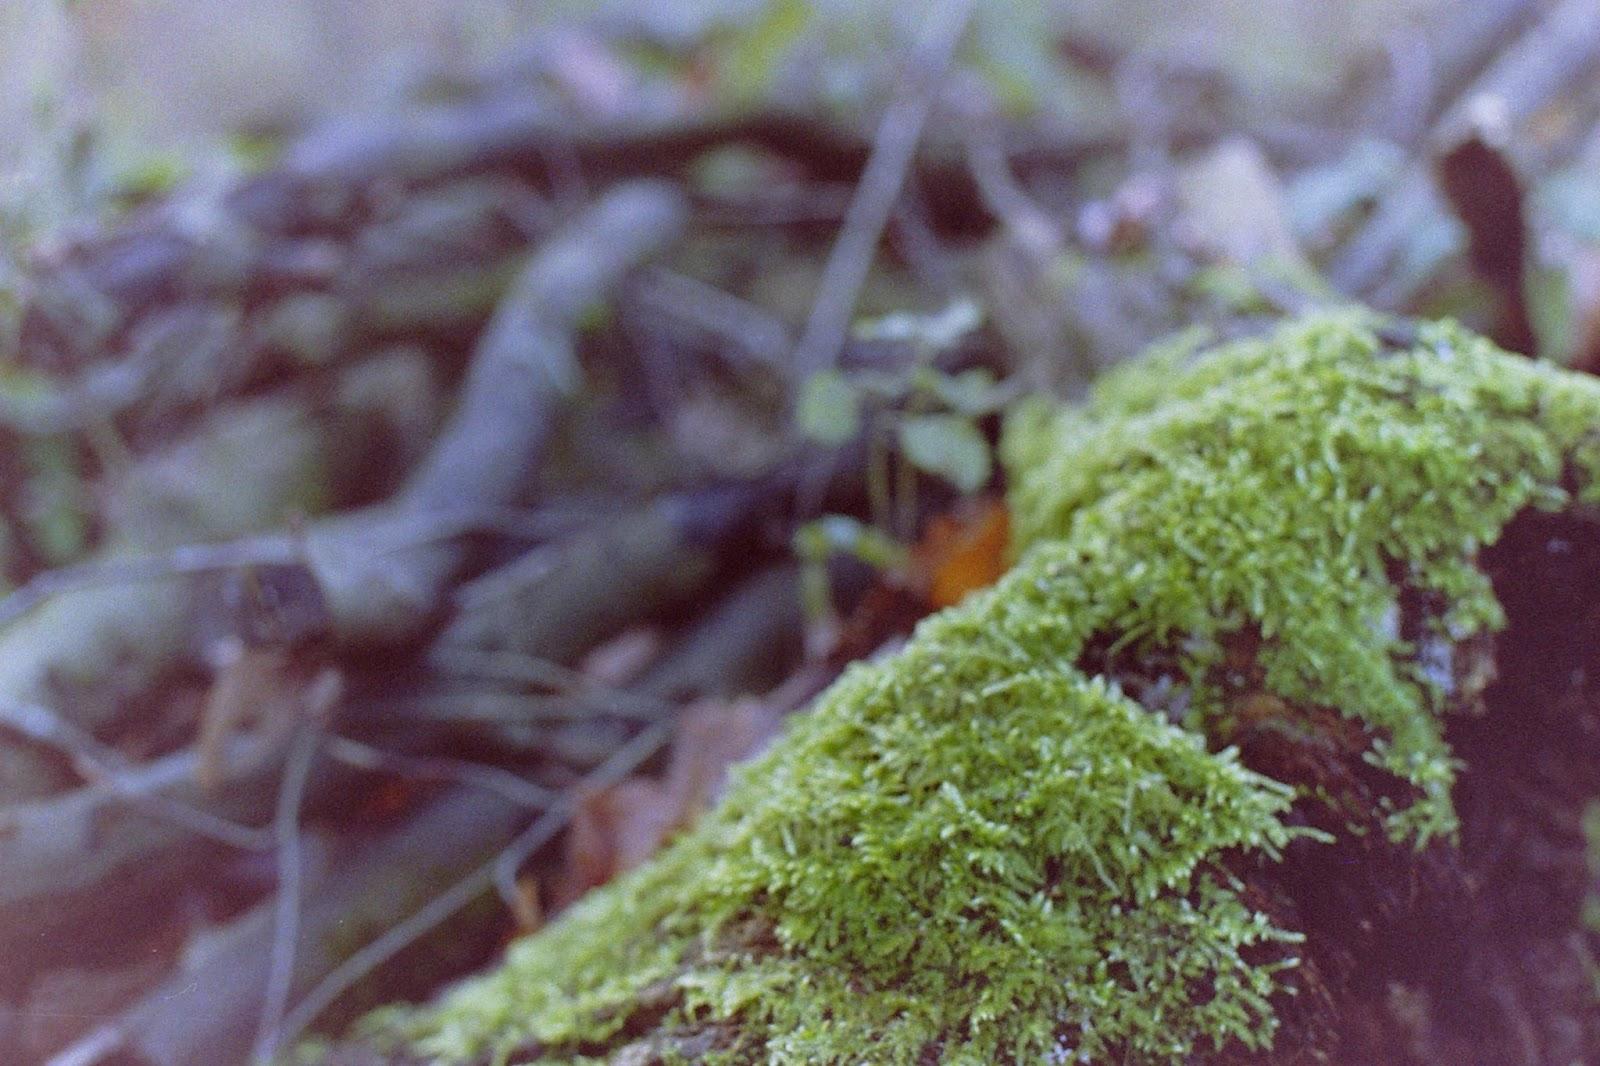 analoge Fotografie, Kamera, Ruhrgebiet, Wald